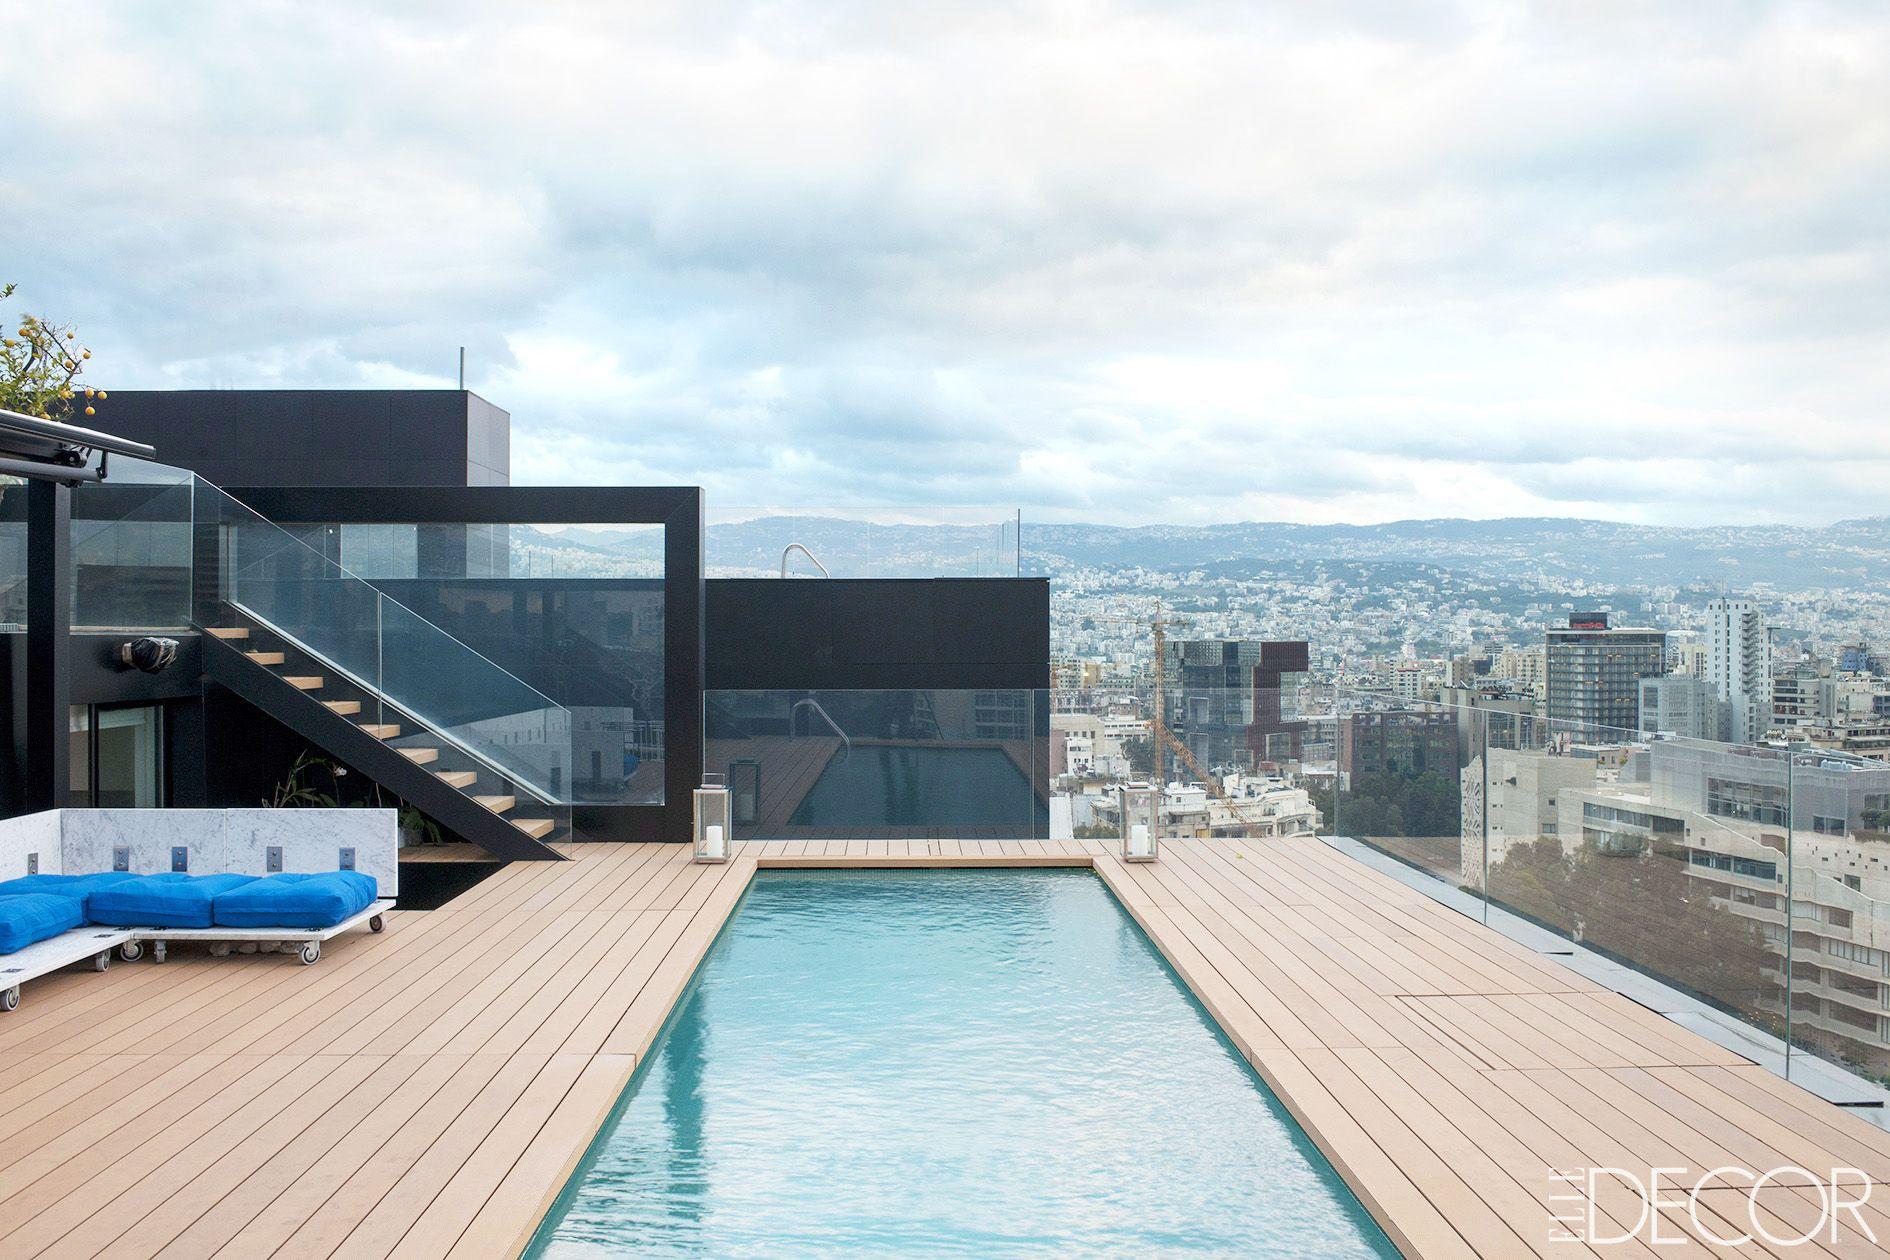 Pool Designs   Pool Design Ideas